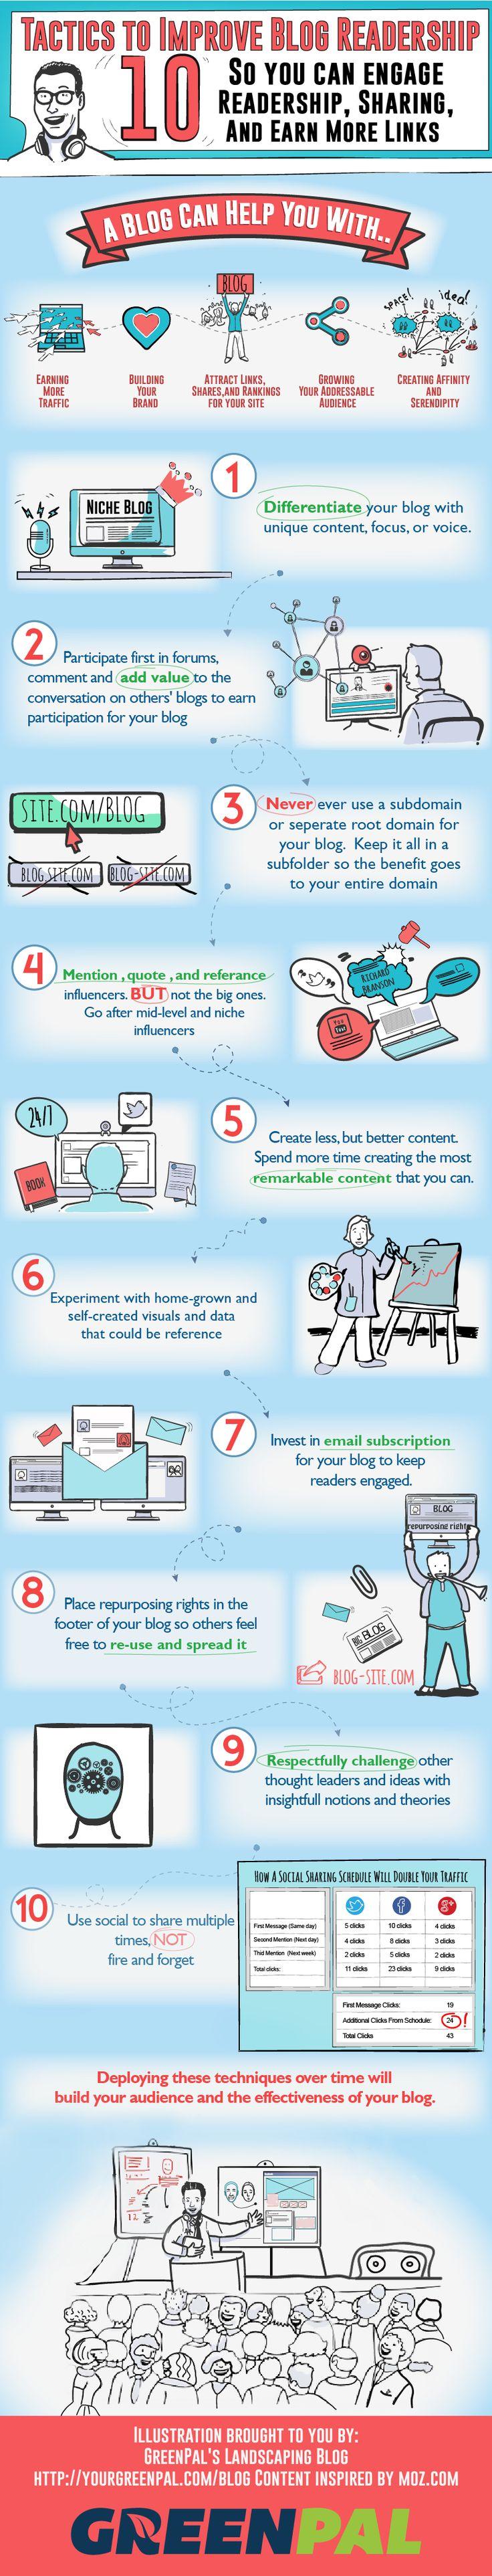 Infographic: 10 Tactics to Improve Blog Readership #infographic